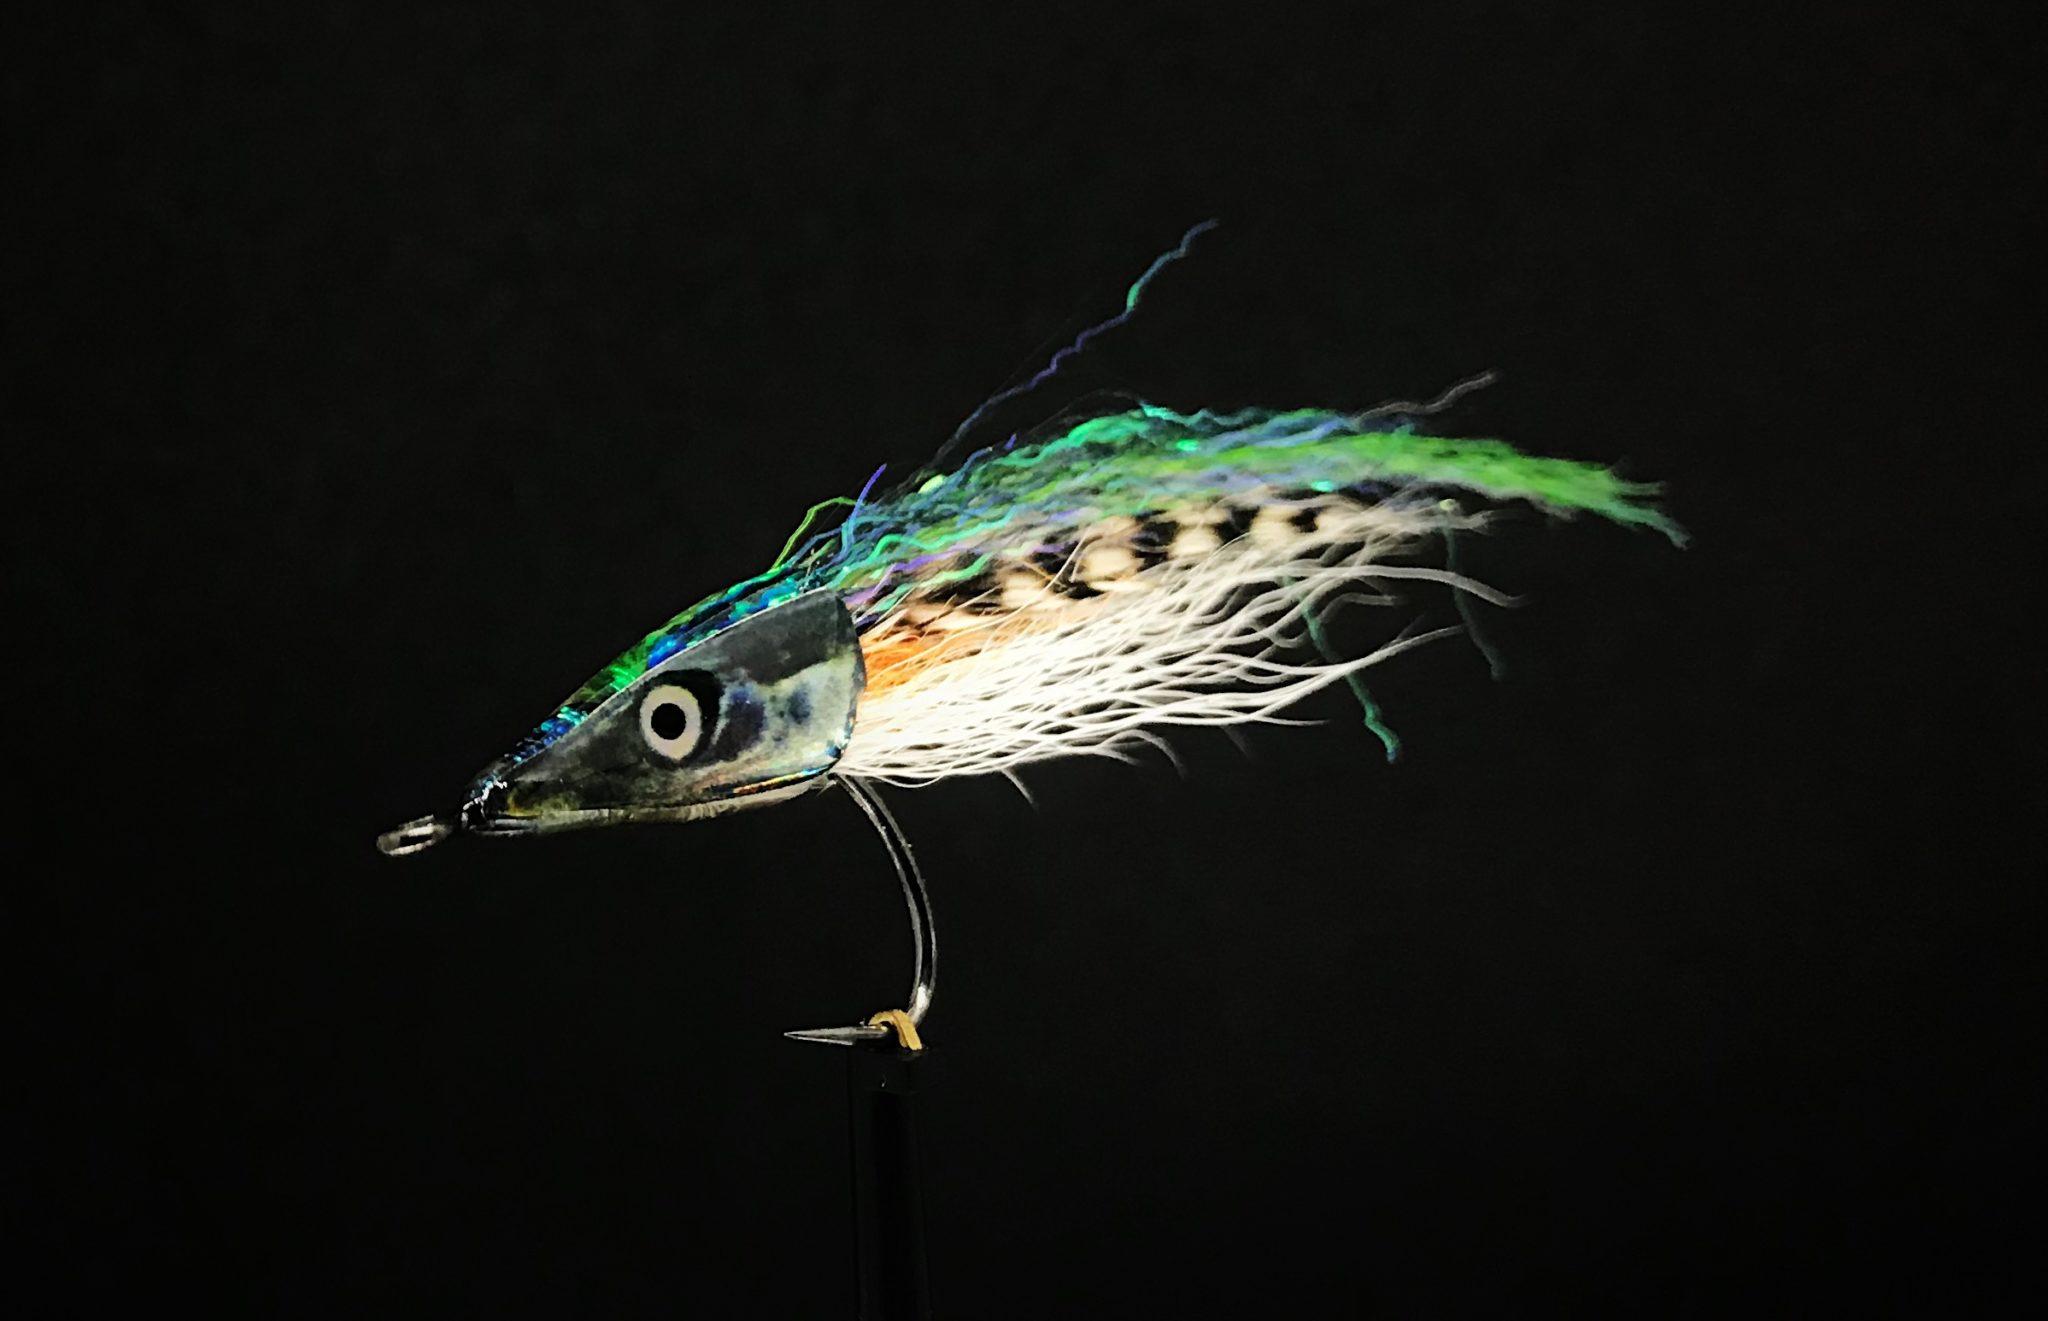 Fish Foil Sandeel - En Tobis kystflue